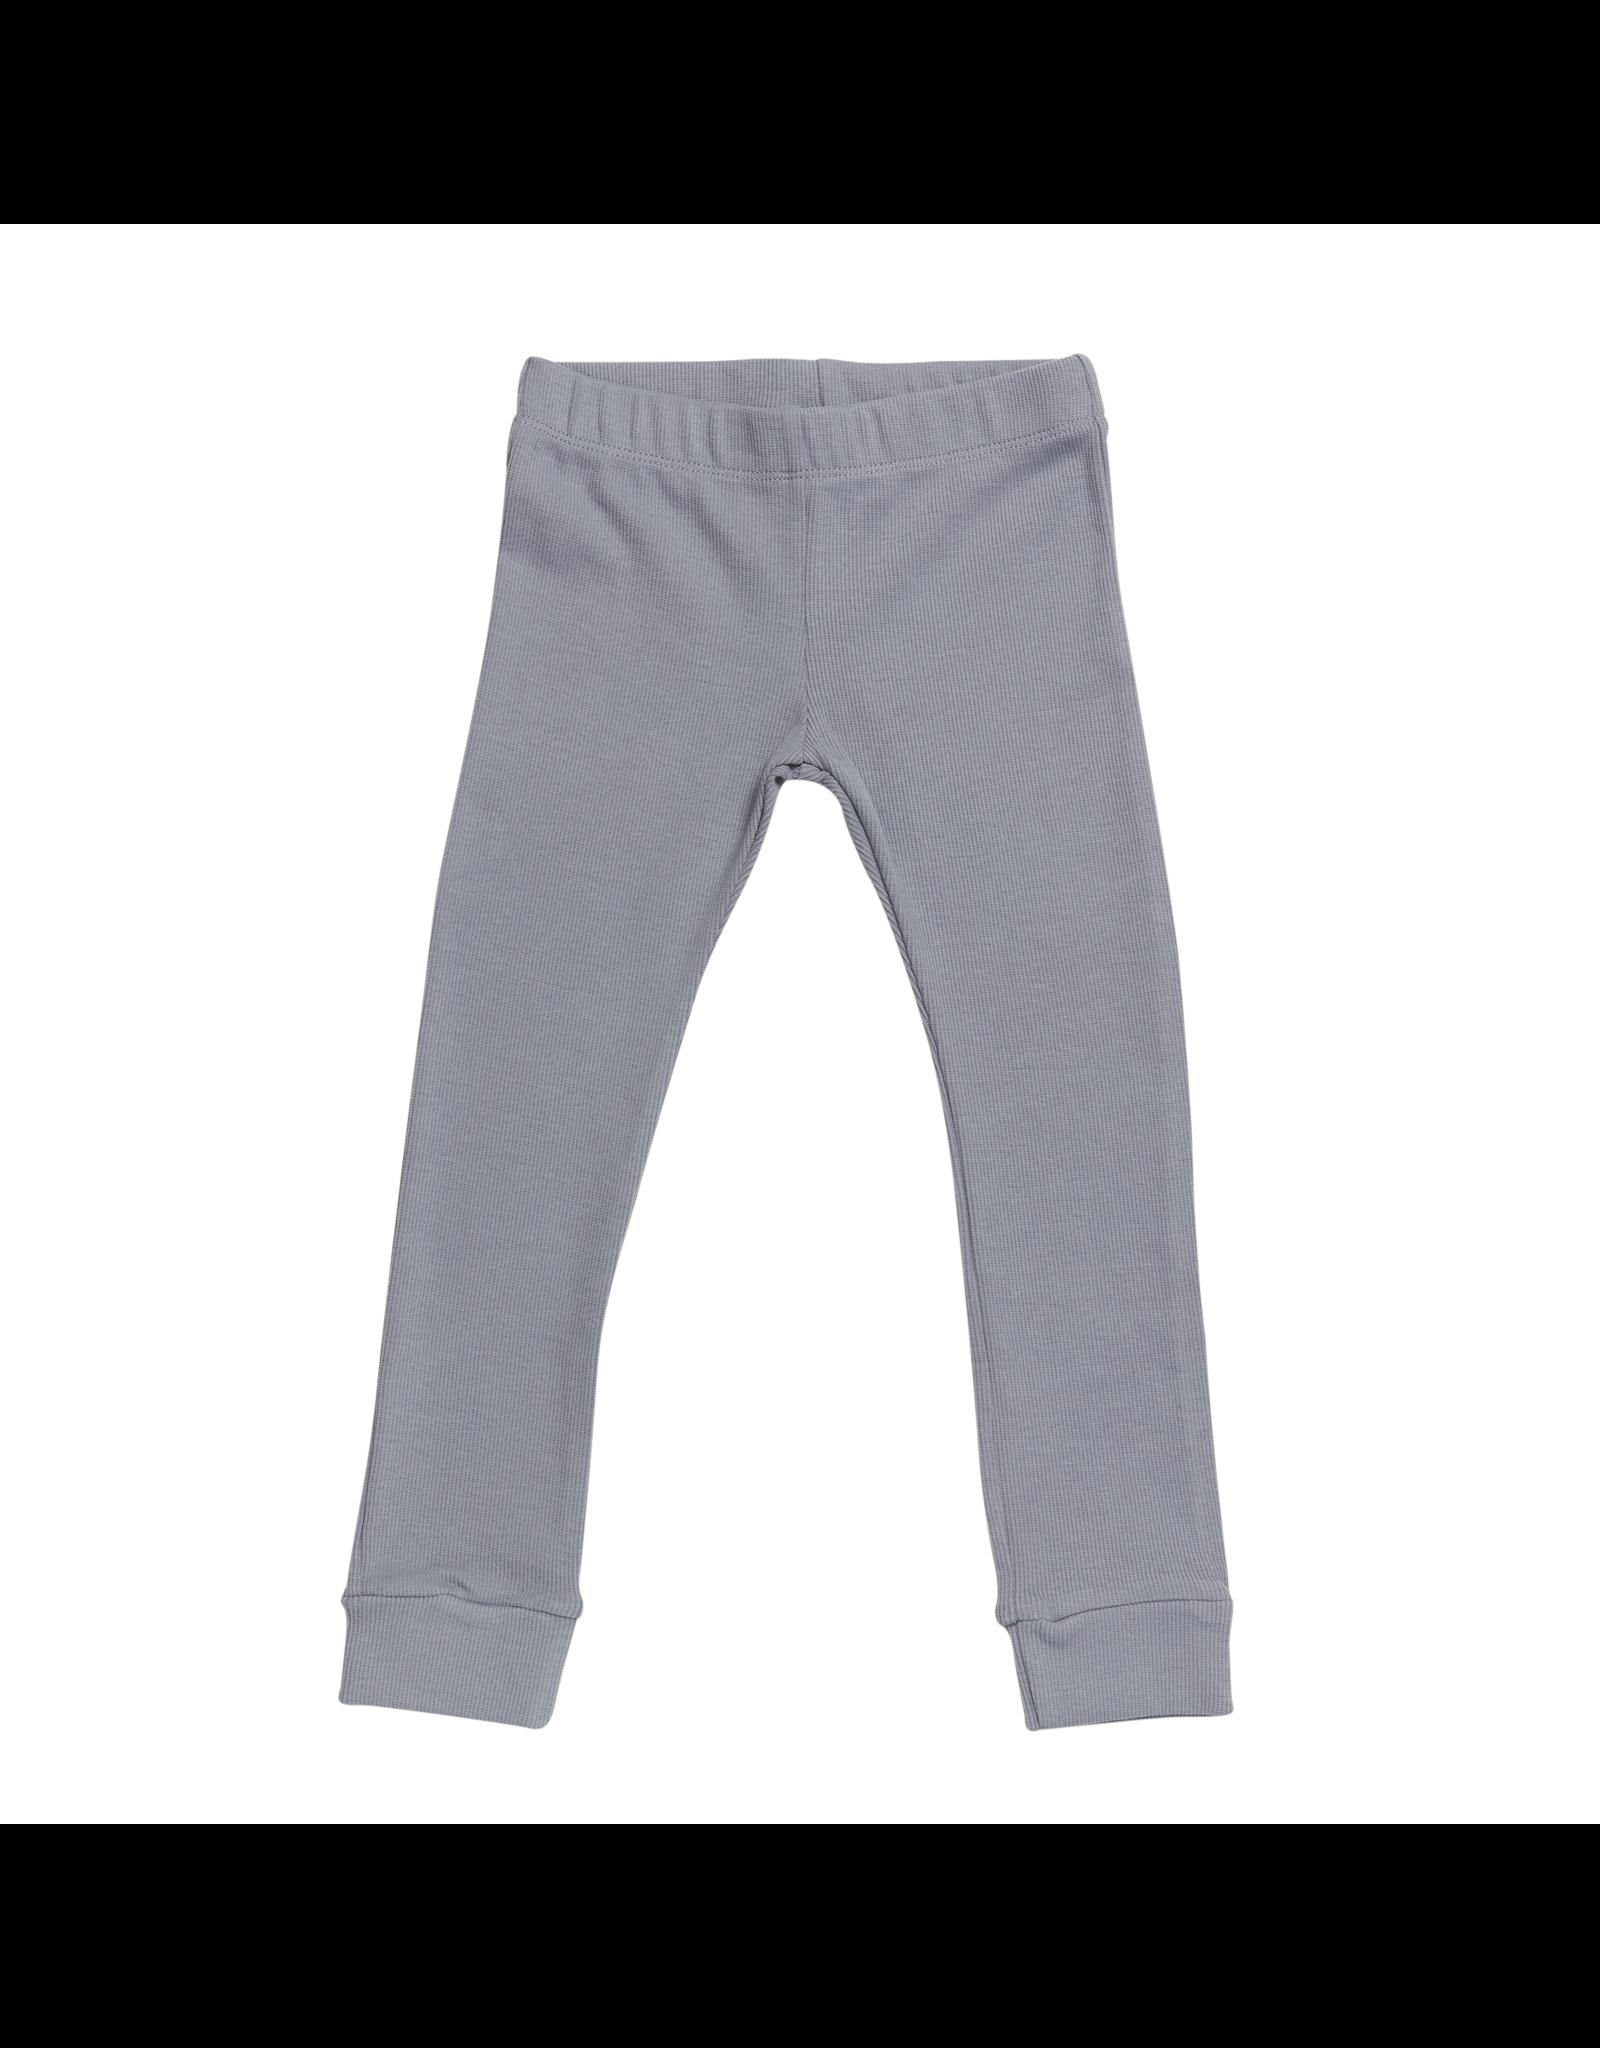 Blossom Kids Legging - soft rib - Blue Grey